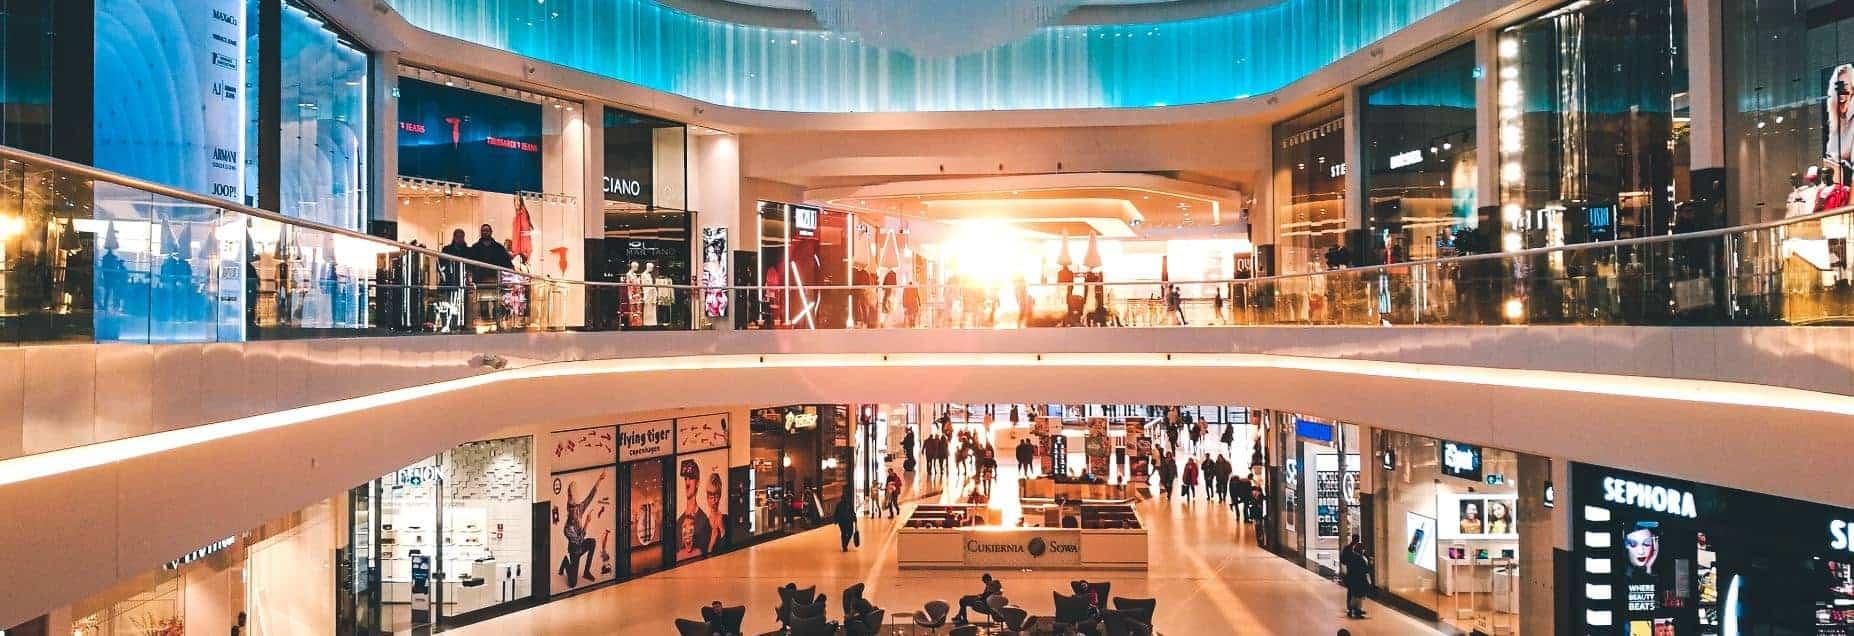 Liste Investment Gesellschaften Retail Shopping Center